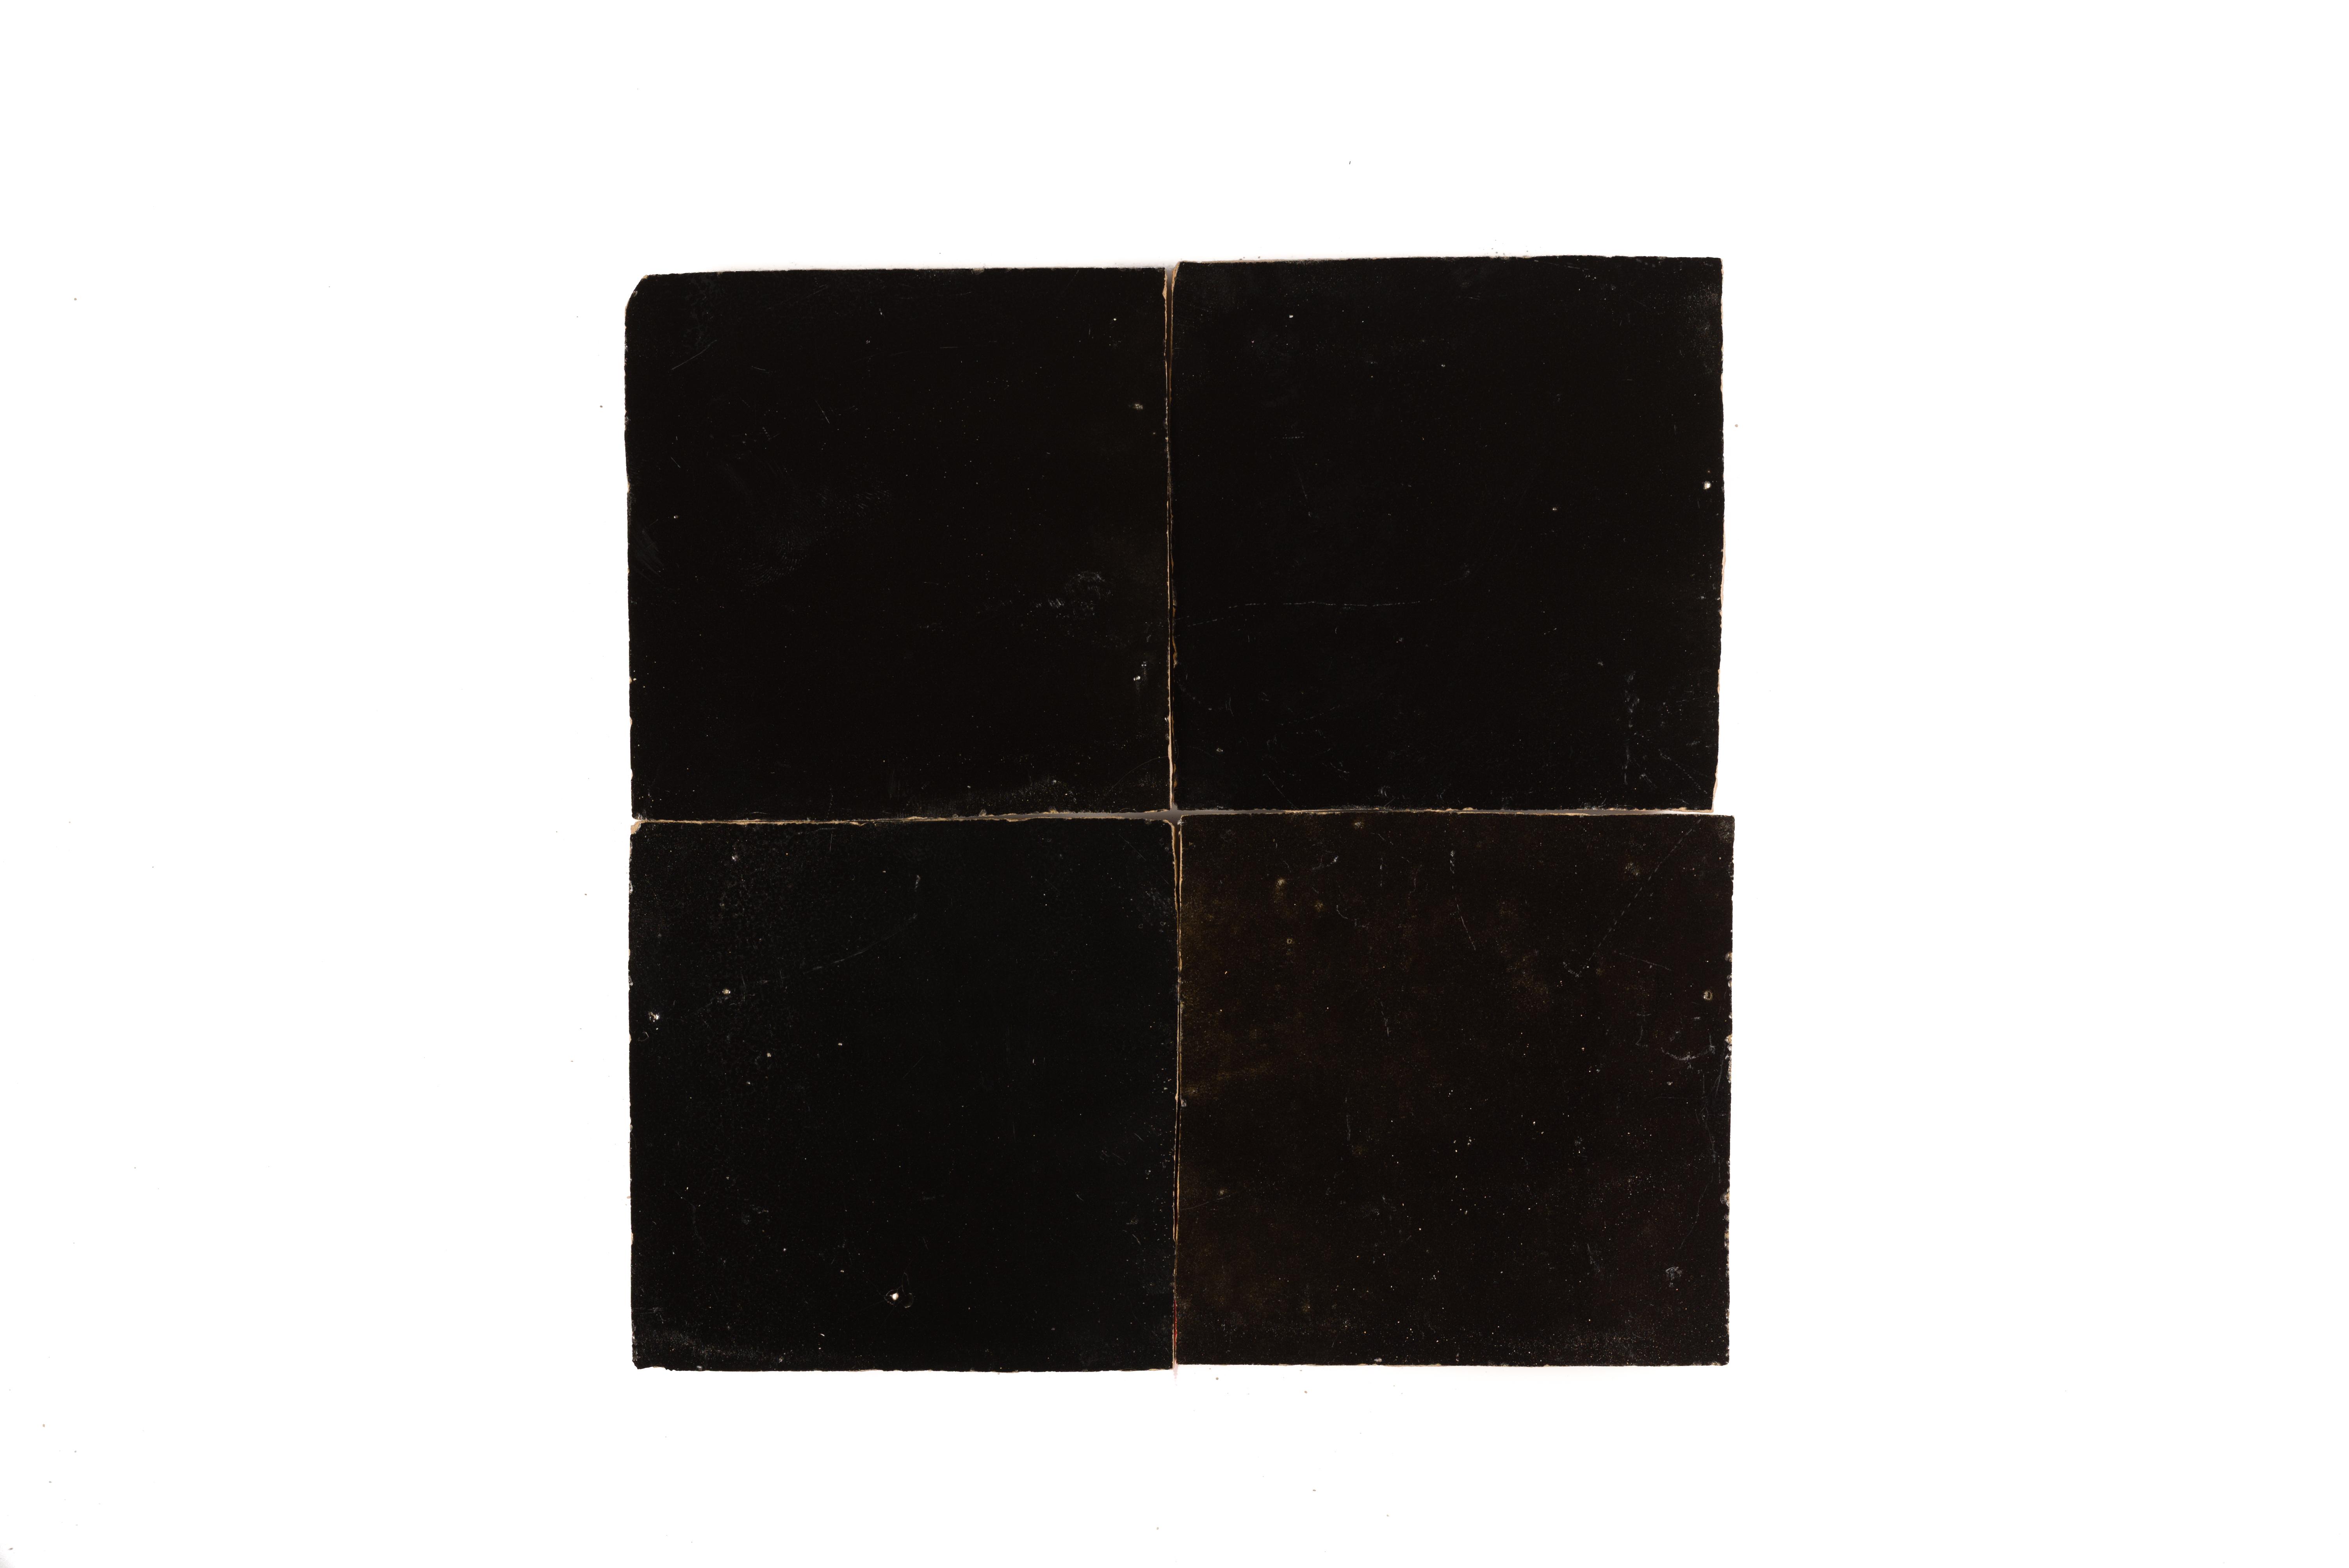 Marokkaanse Tegels Outlet : Zr rabat black glossy mozaiekjes diverse soorten tegels